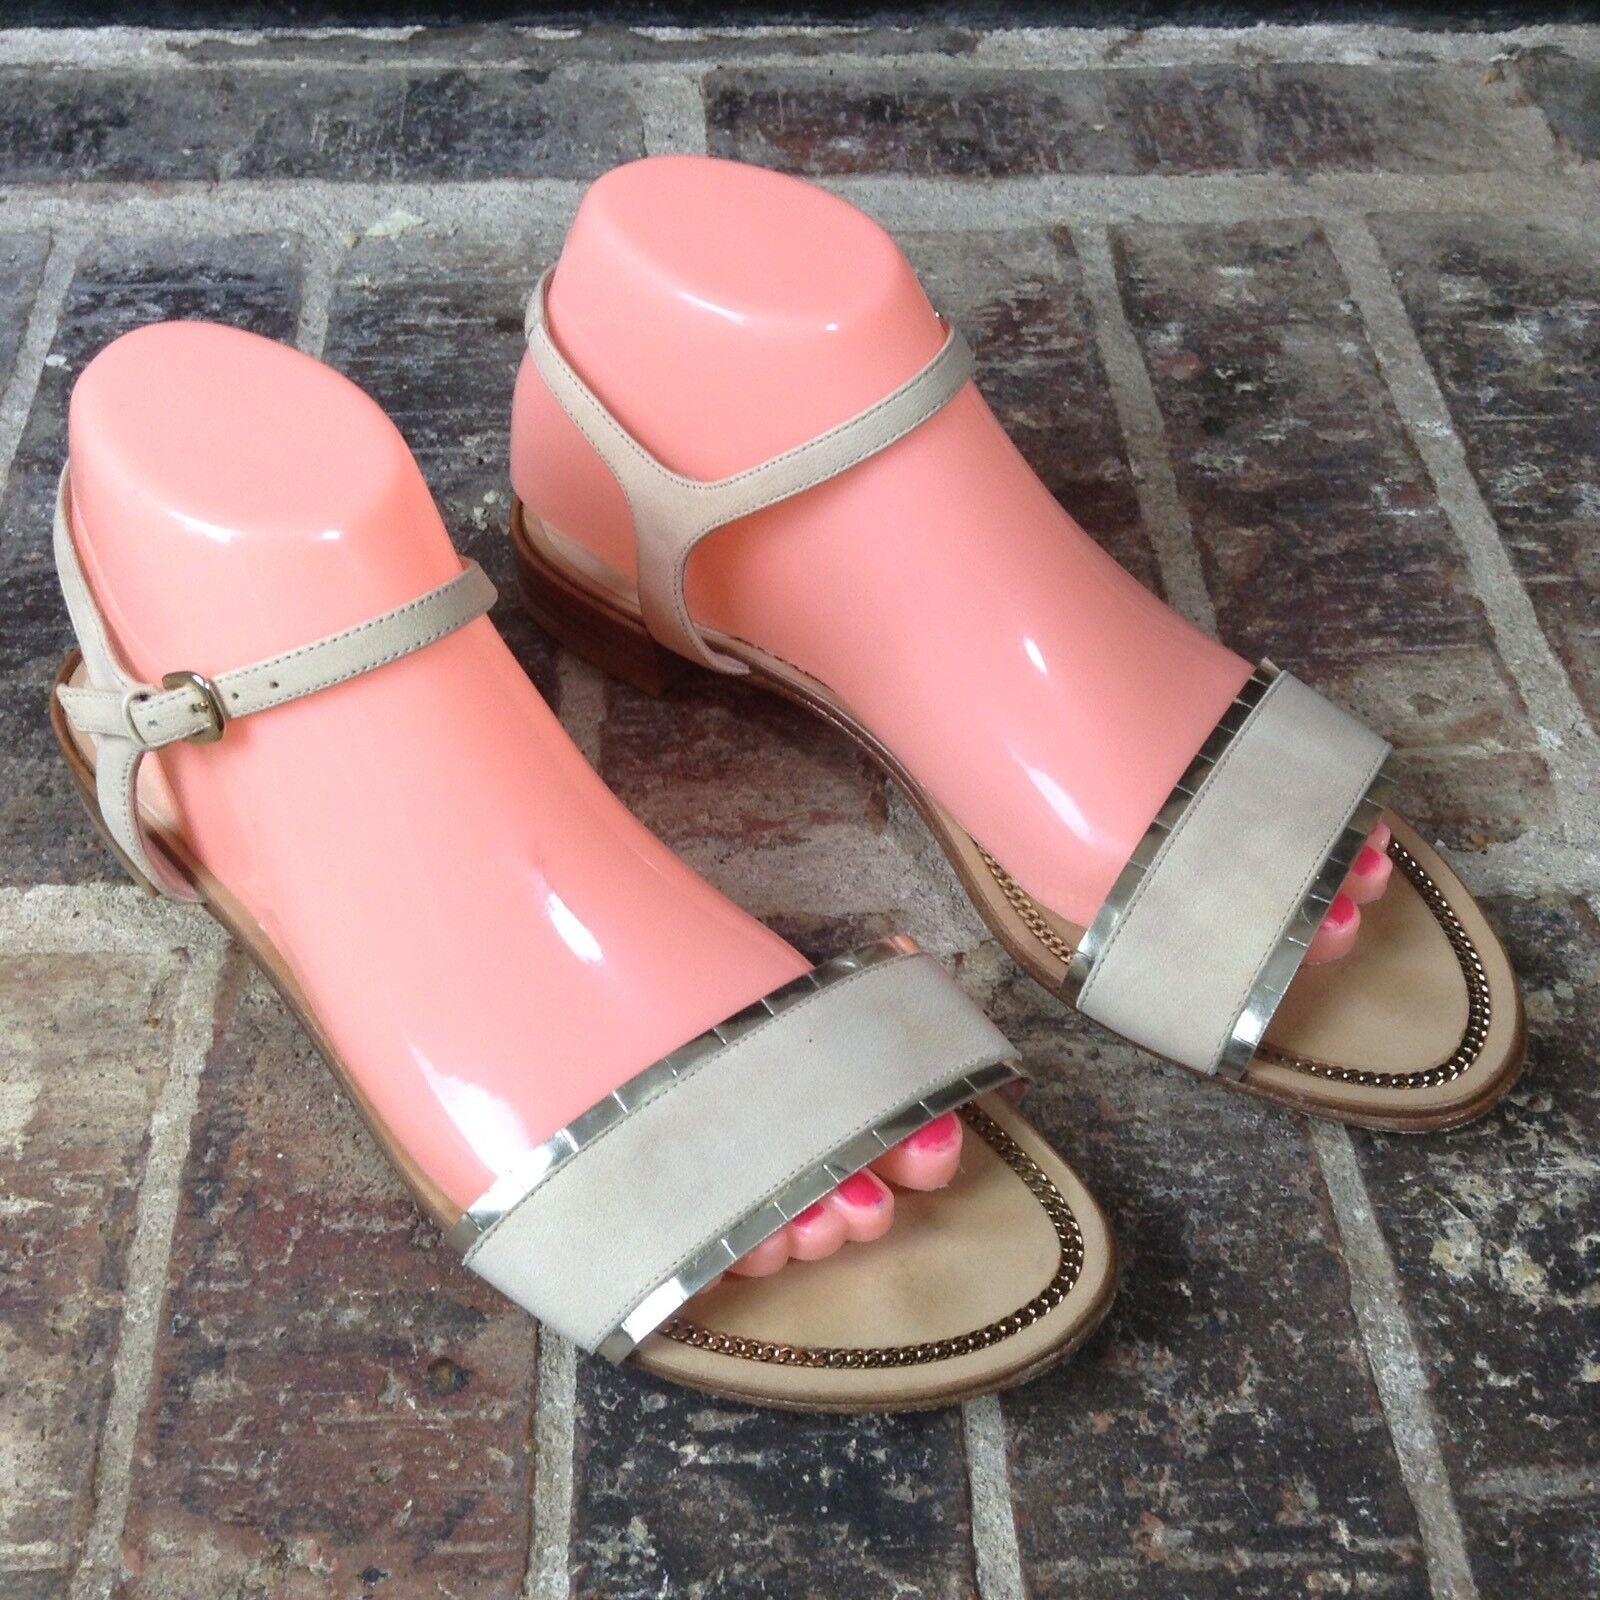 Stuart Weitzman PW56163 Nude/Beige Ankle Strap Flats Sandales Metallic Tabs Sz 8